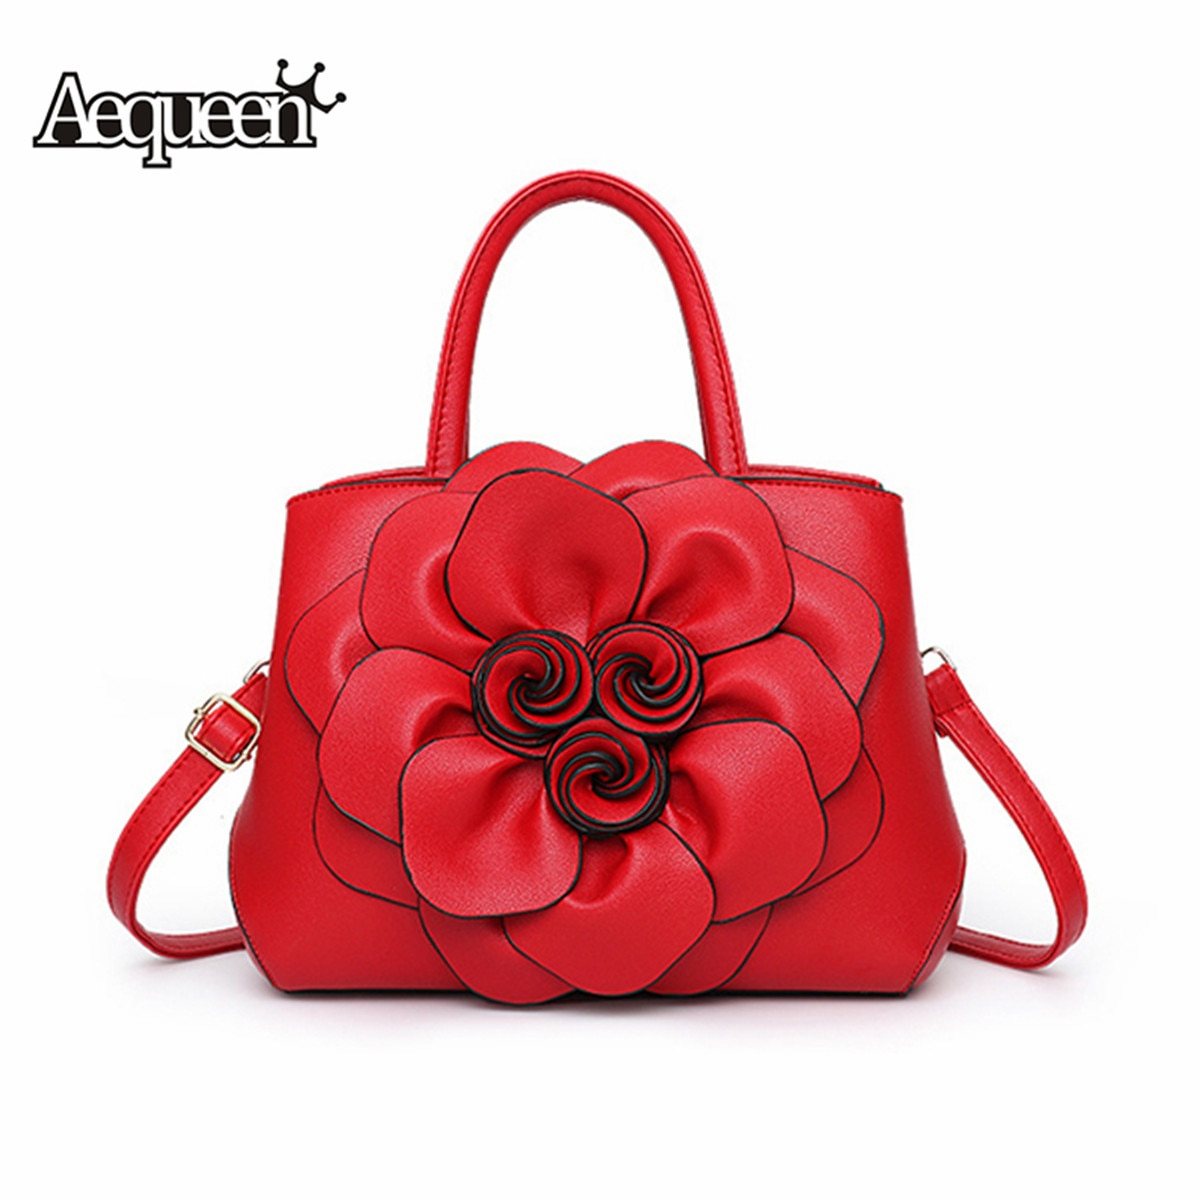 2019 Red Women Bags Luxury Handbag Female Designer Shoulder Bag Casual Shopping Tote PU Leather Hand bags Flowers Feminine Bolsa